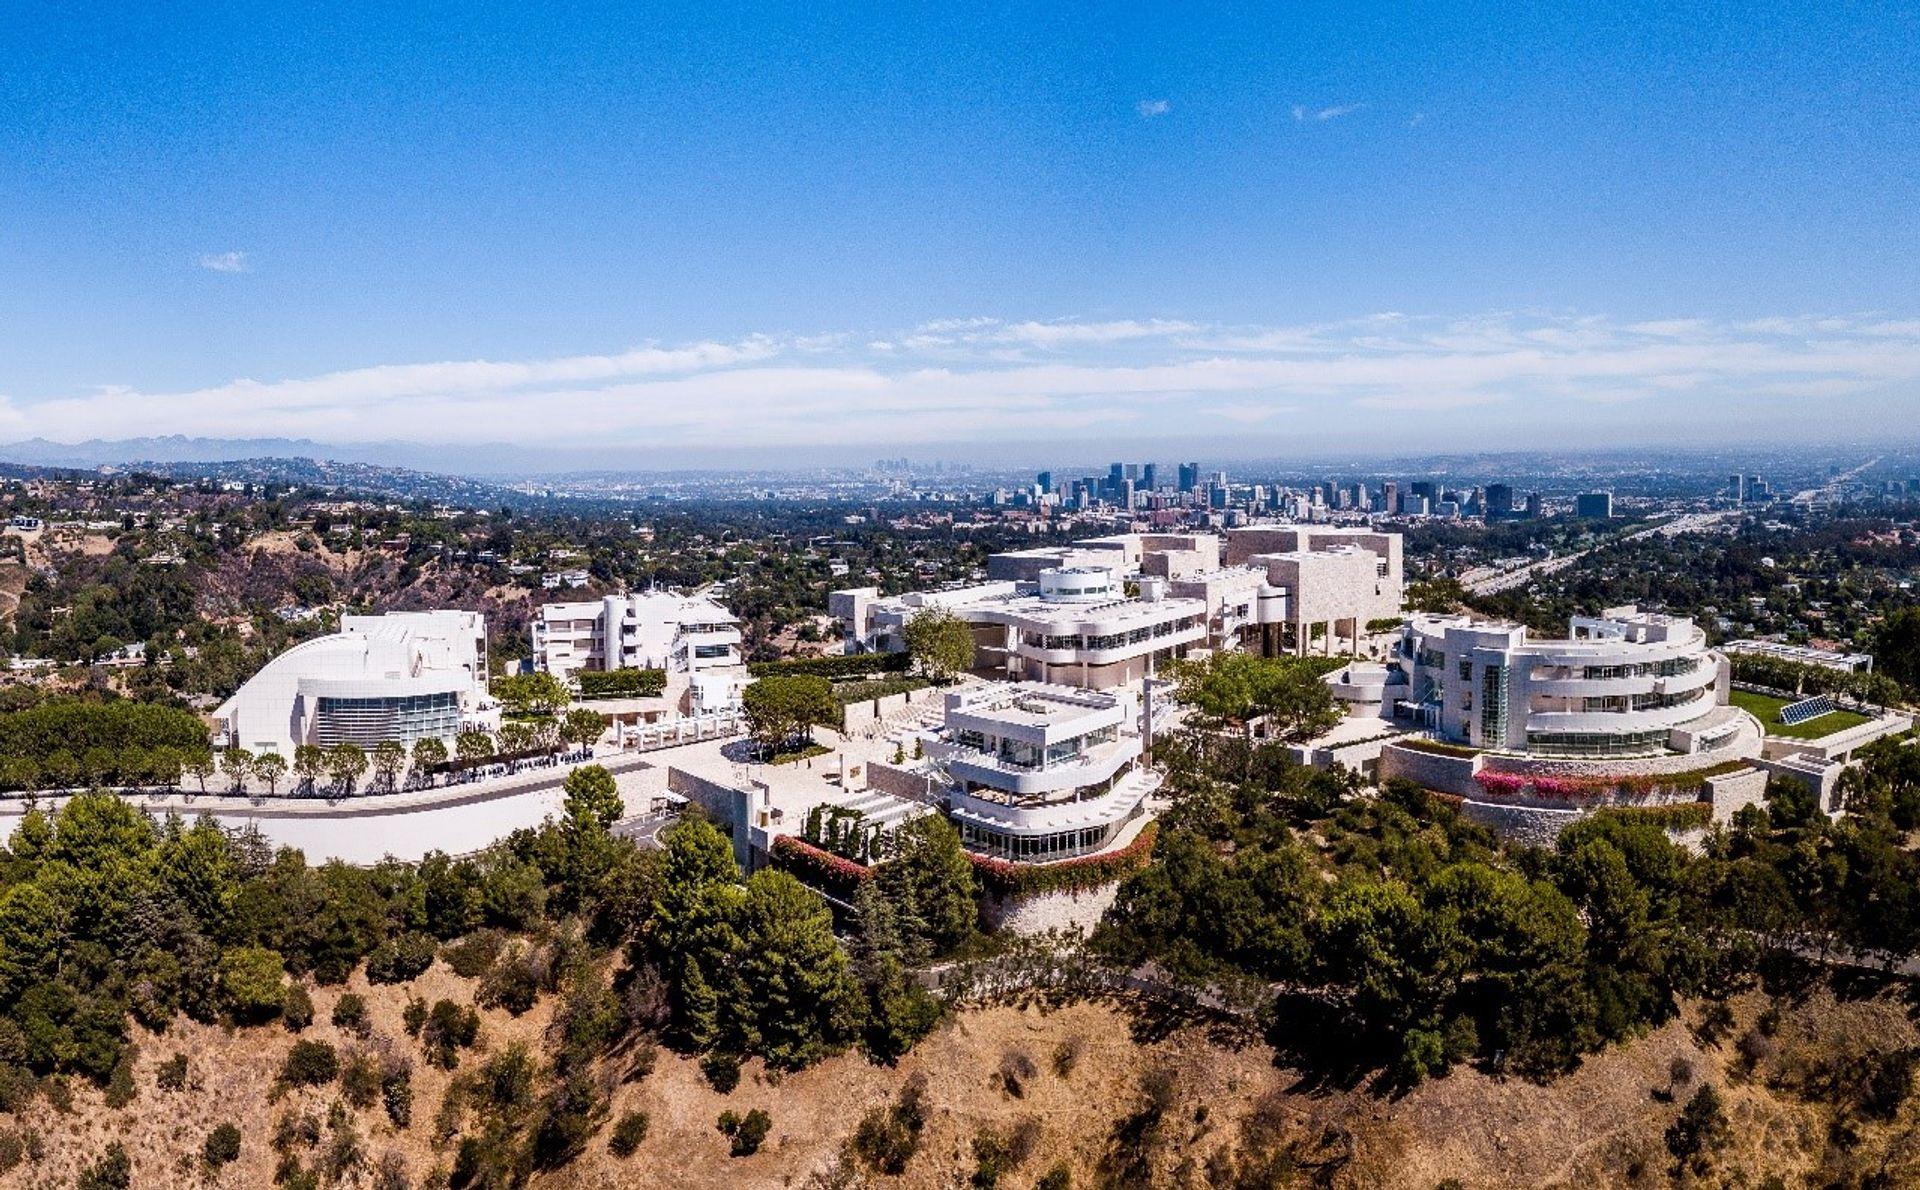 The Getty Center in Los Angeles J. Paul Getty Trust